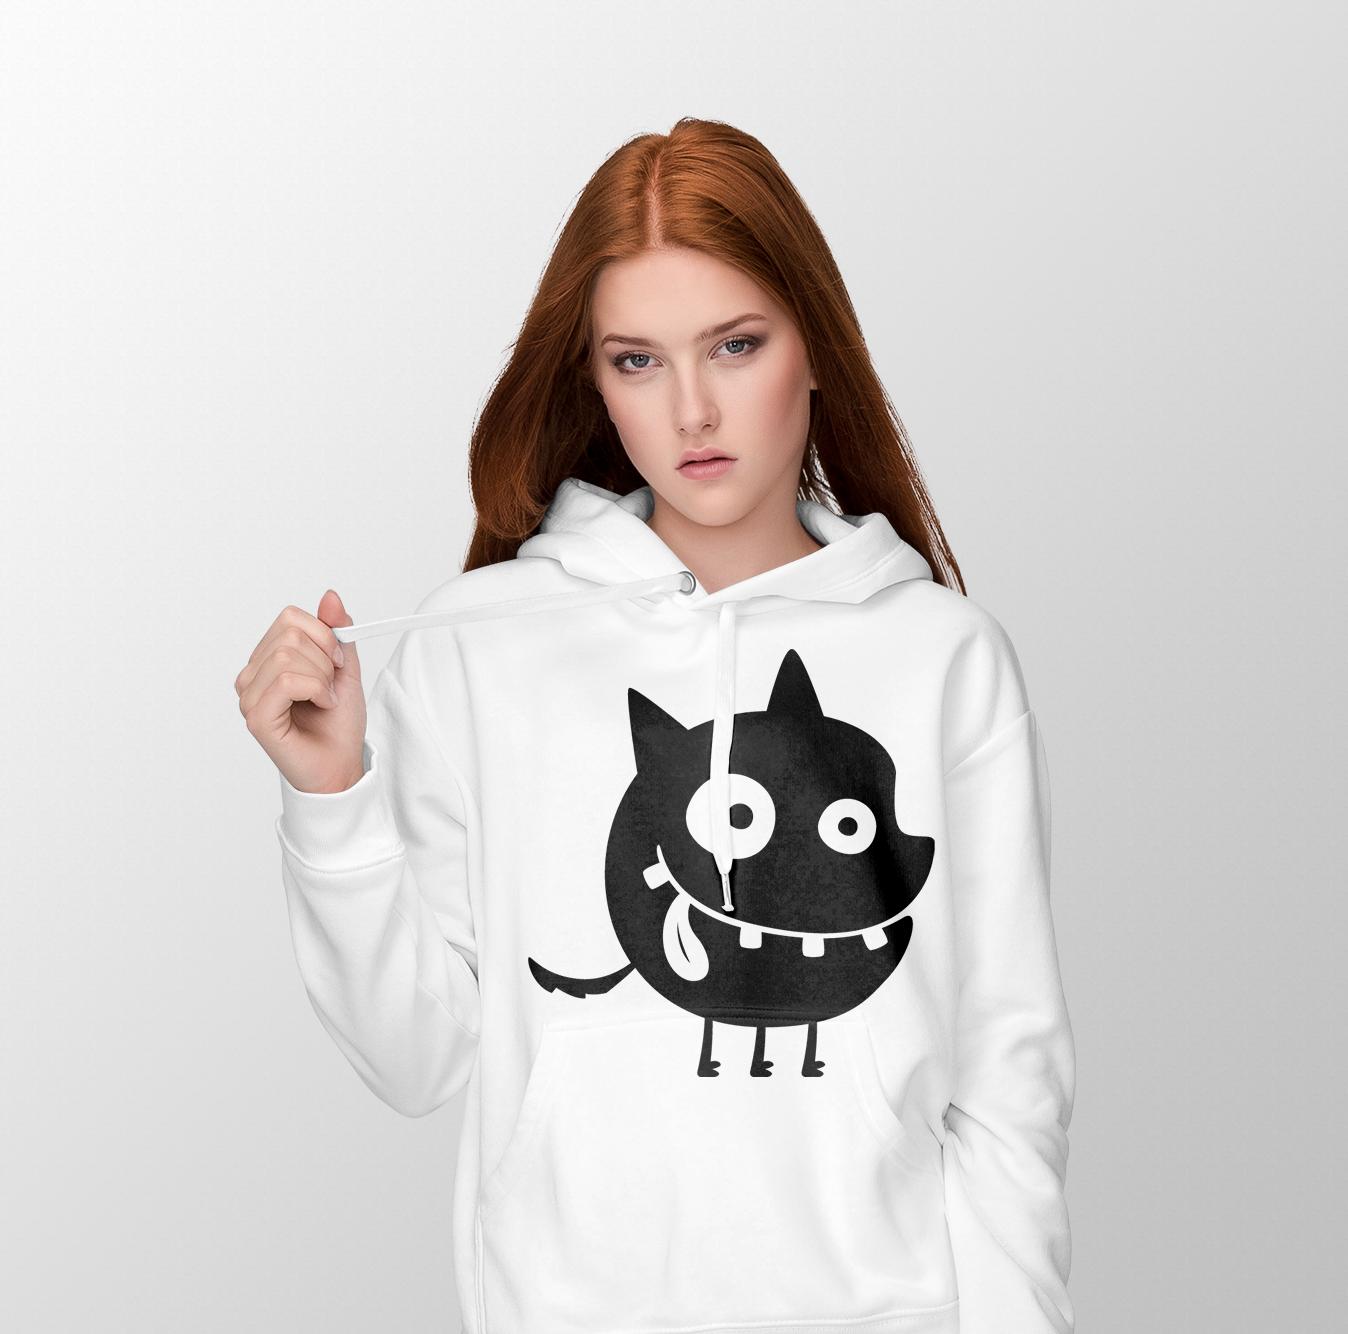 hoodie-female-front2